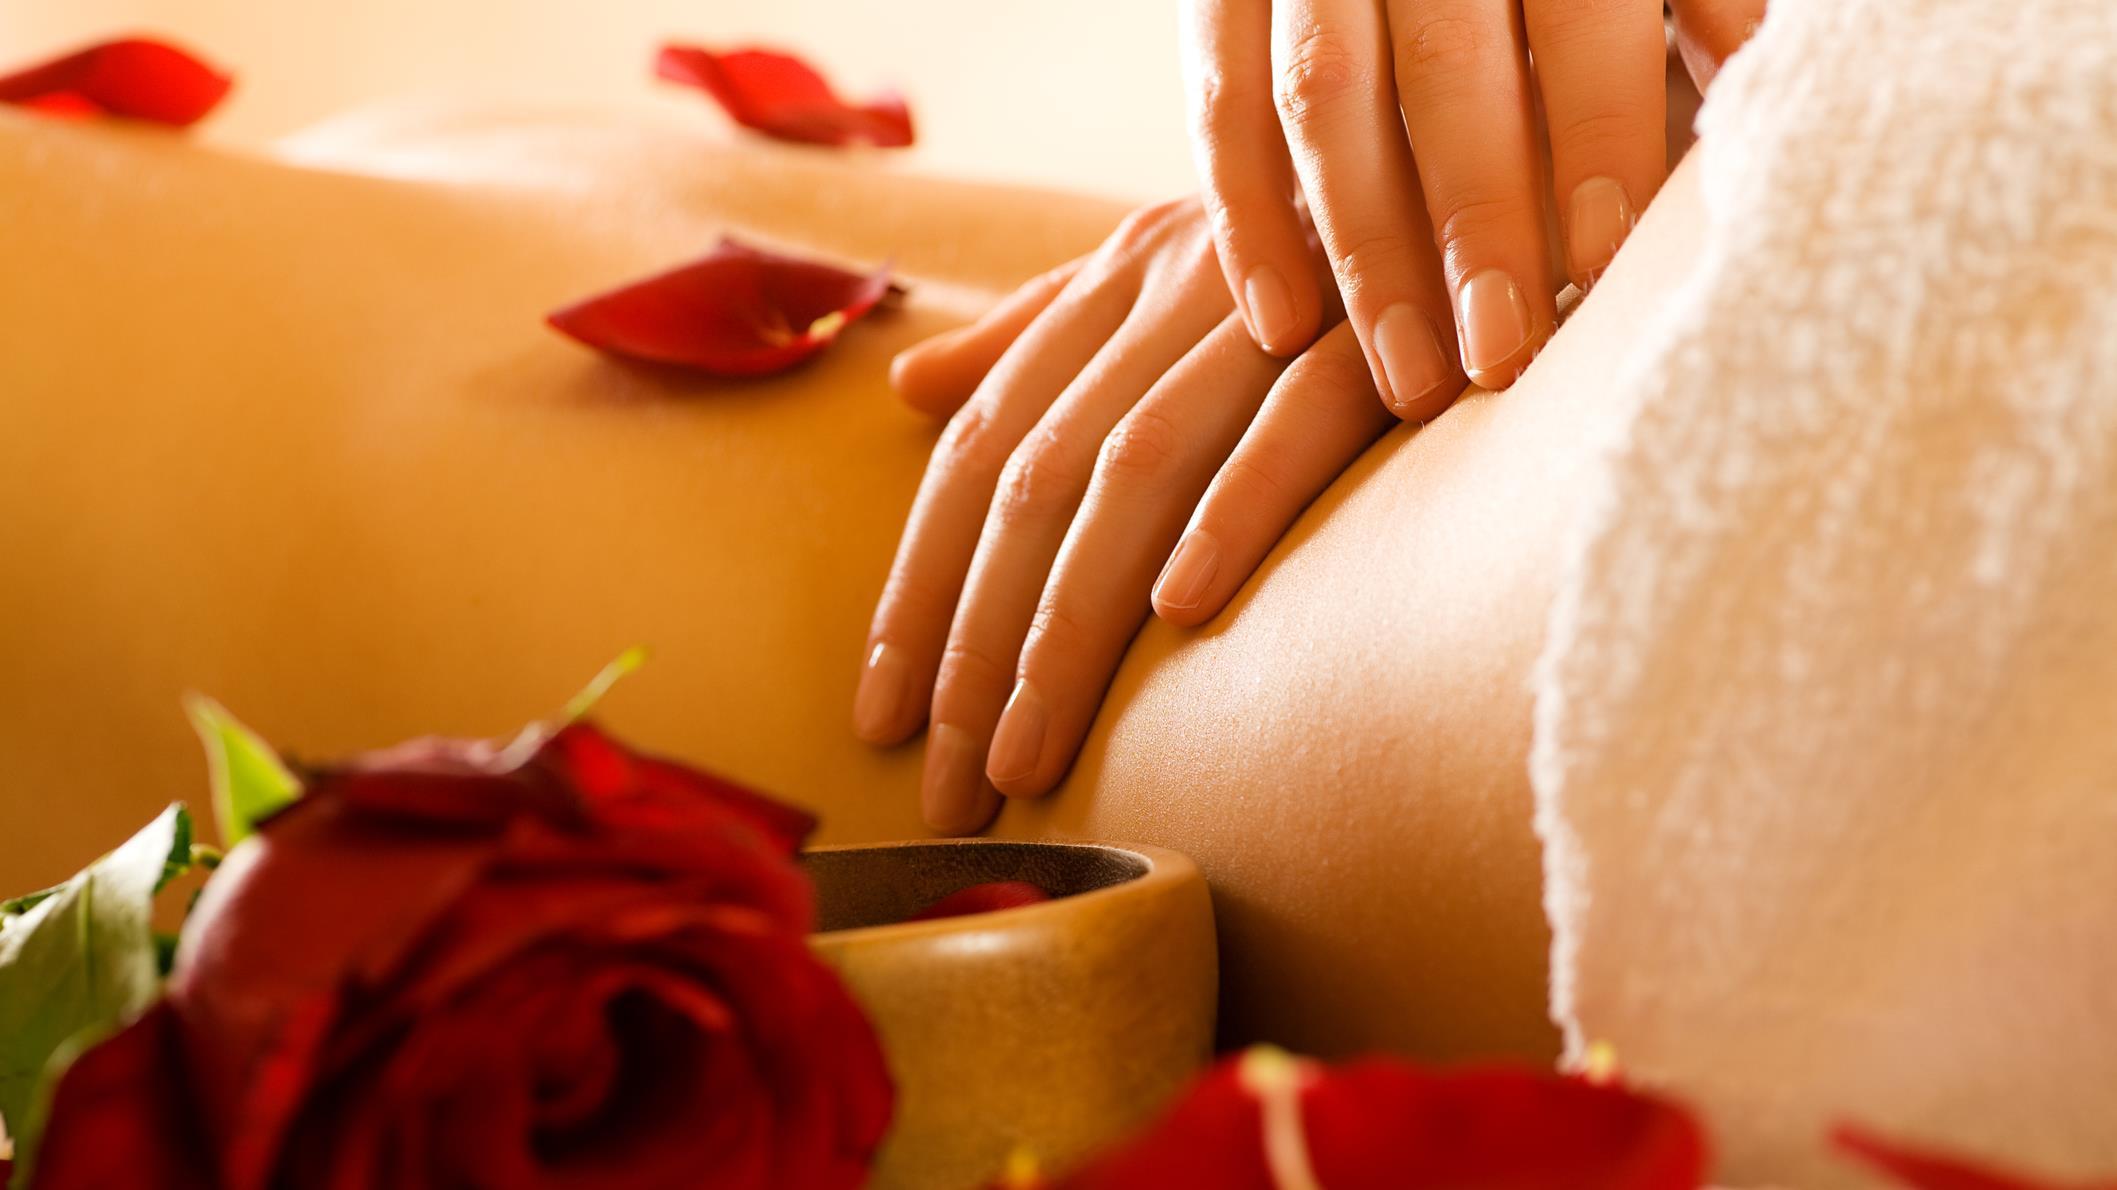 angst voor vrouwen erotische massagesalon